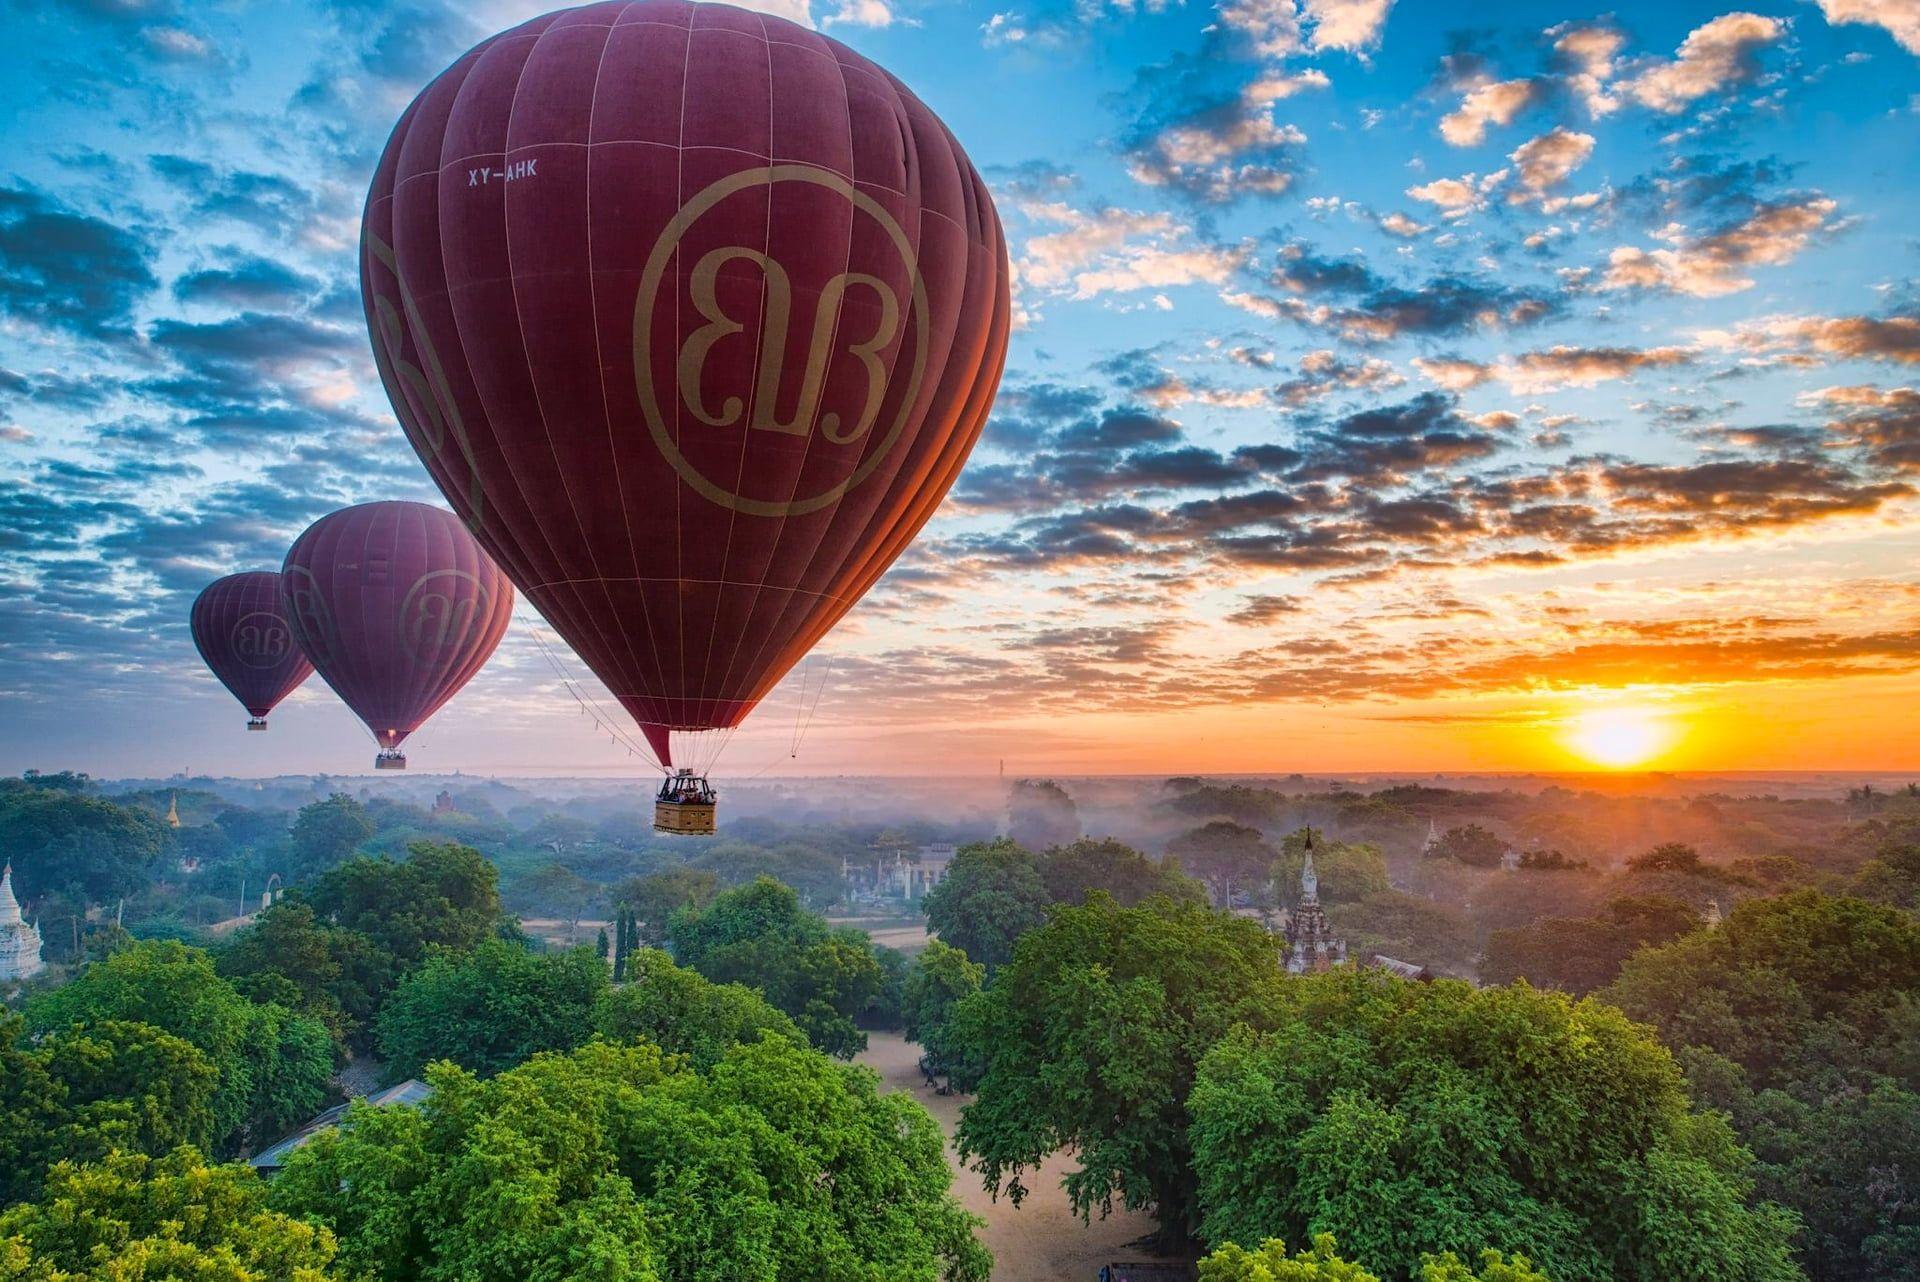 three pink hot air balloons the sky #sunset #balloons #panorama #Myanmar #Burma #Myanmar #Bagan #Burma #Pagan #1080P #wallpaper #hdwallpaper #desktop